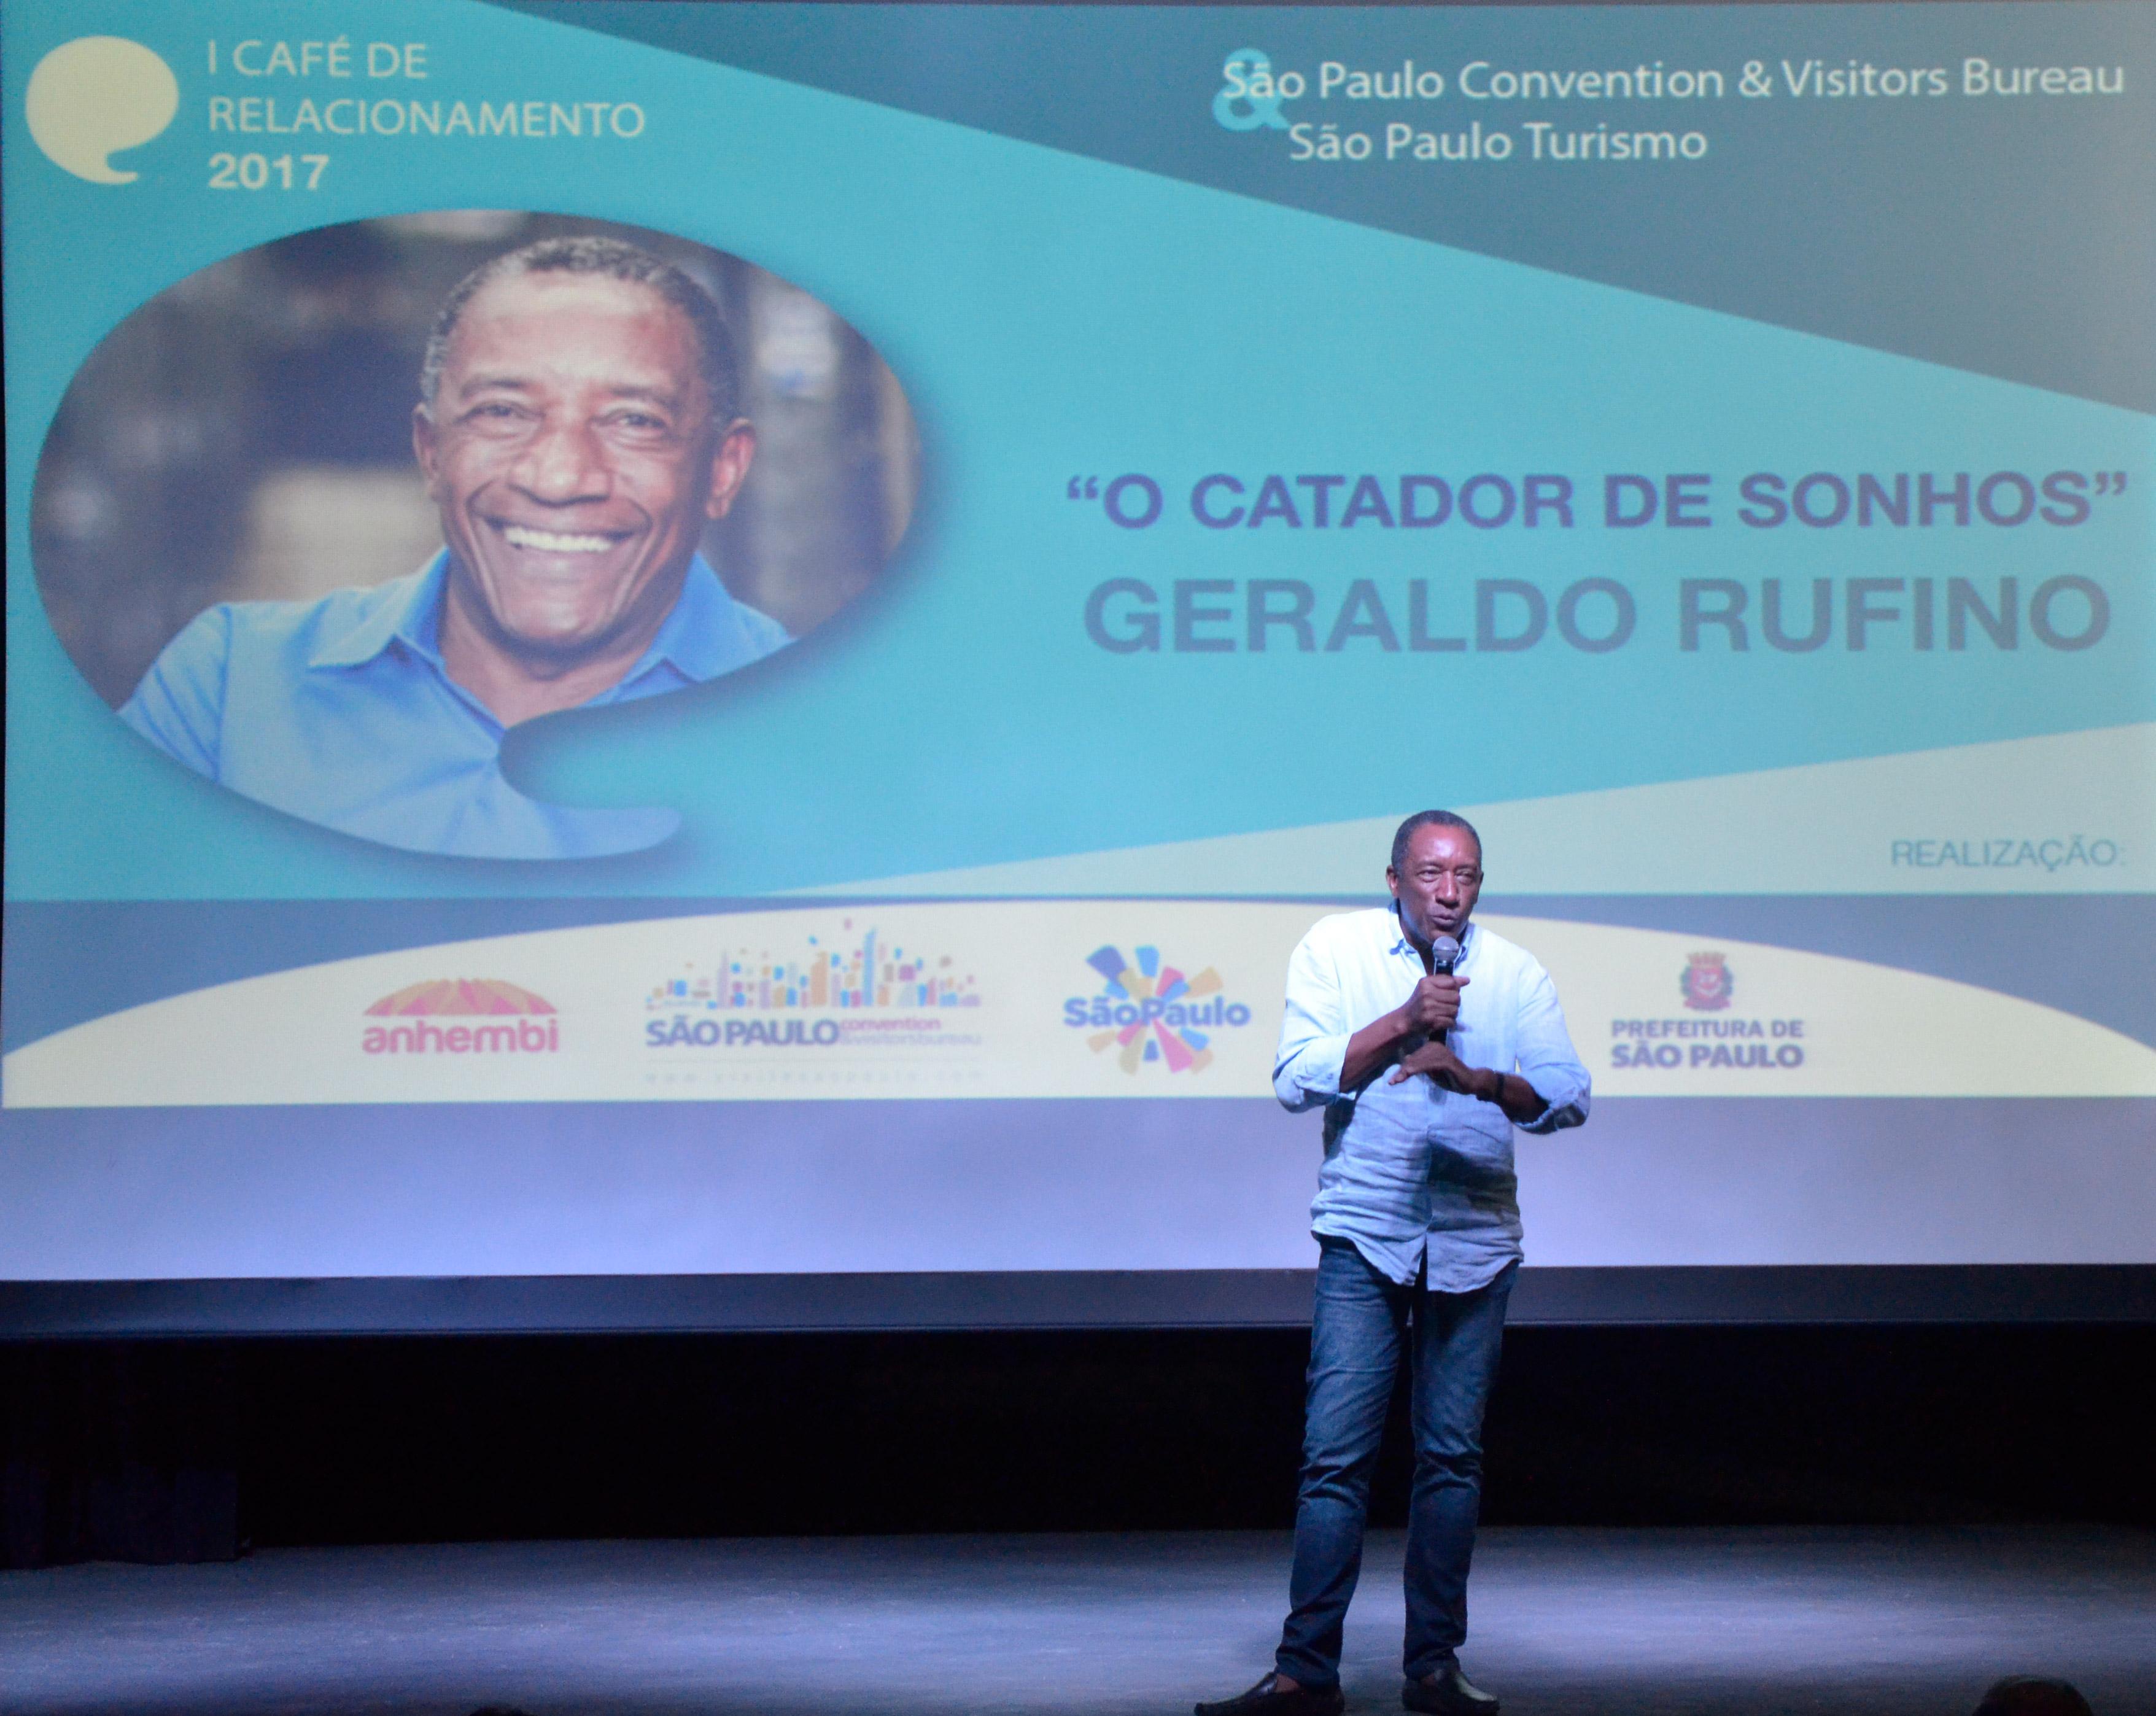 Geraldo Rufino entusiasma o público. Foto: Marcelo Iha/ SPTuris.